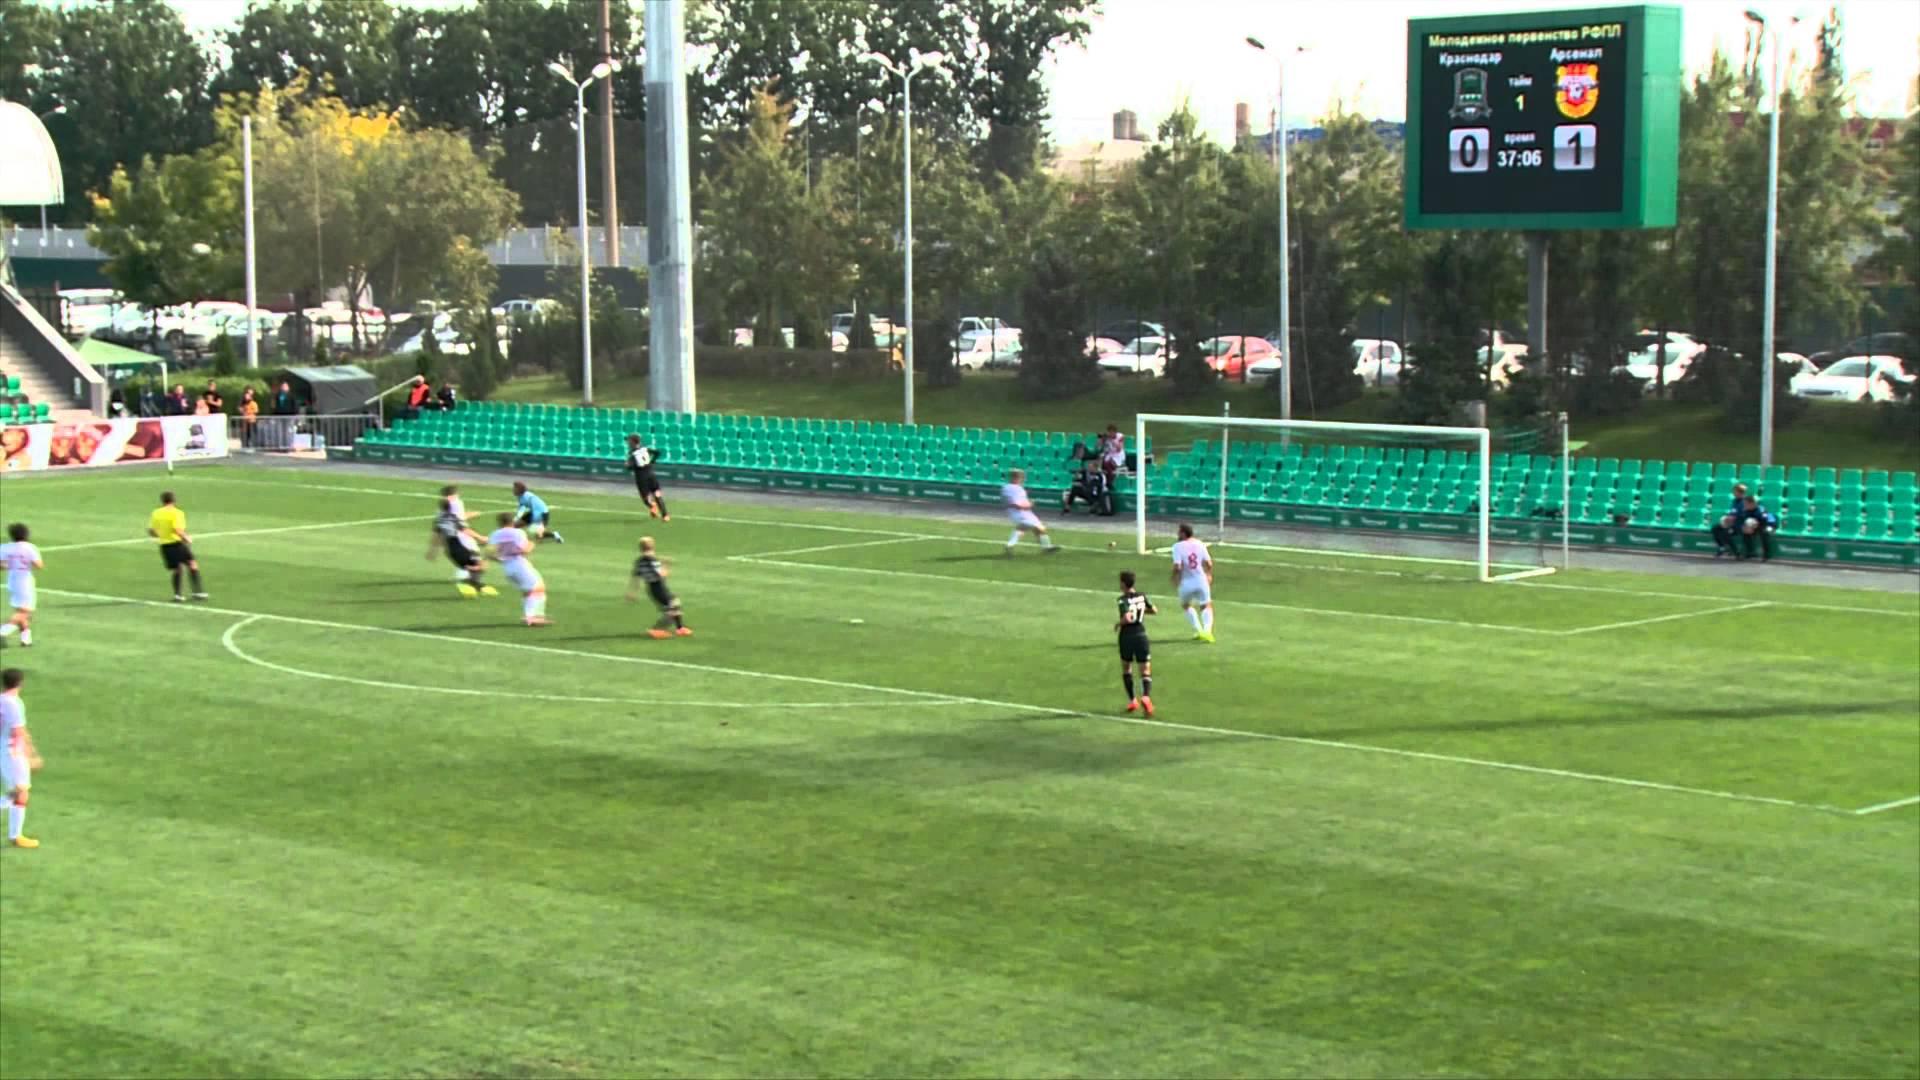 Видеообзор матча 9-го тура Молодежного первенства «Краснодар-мол.» - «Арсенал-мол. (Тула)